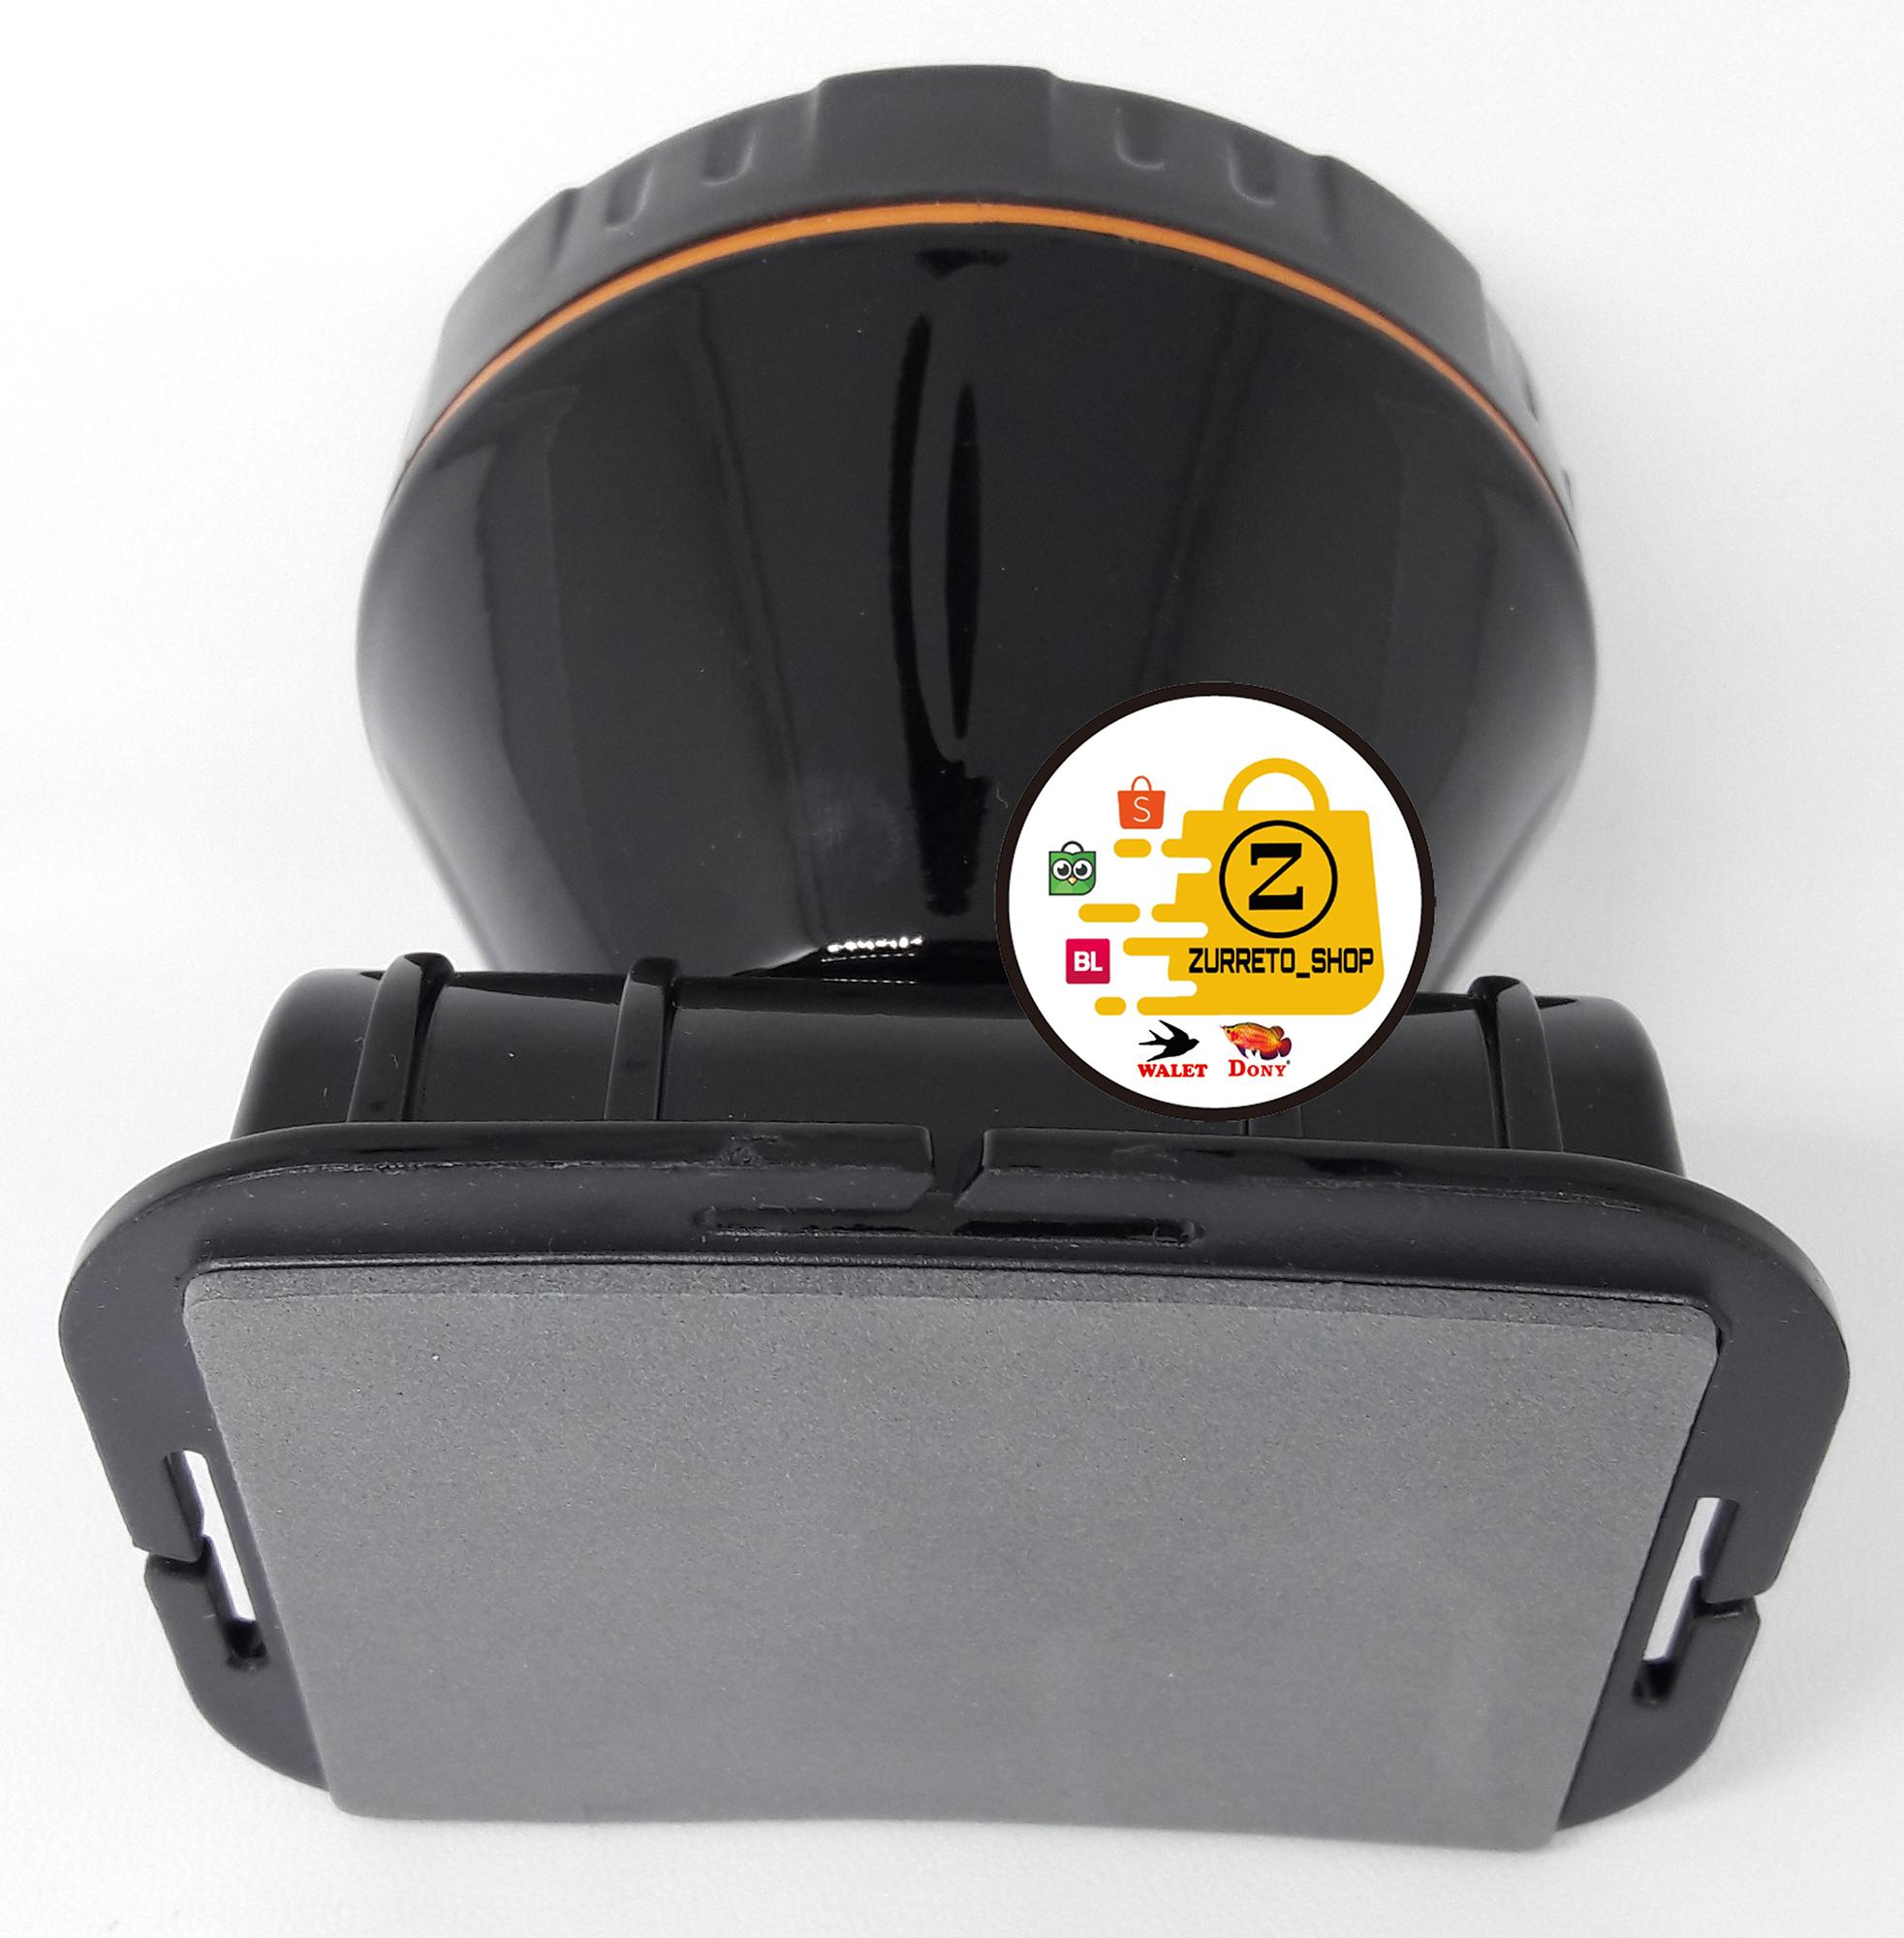 Promo Spesial Senter Kepala Dony Kl 169 Led Kuning Di Online Shop Hitam Manis Anti Gores Cas 8 W 4